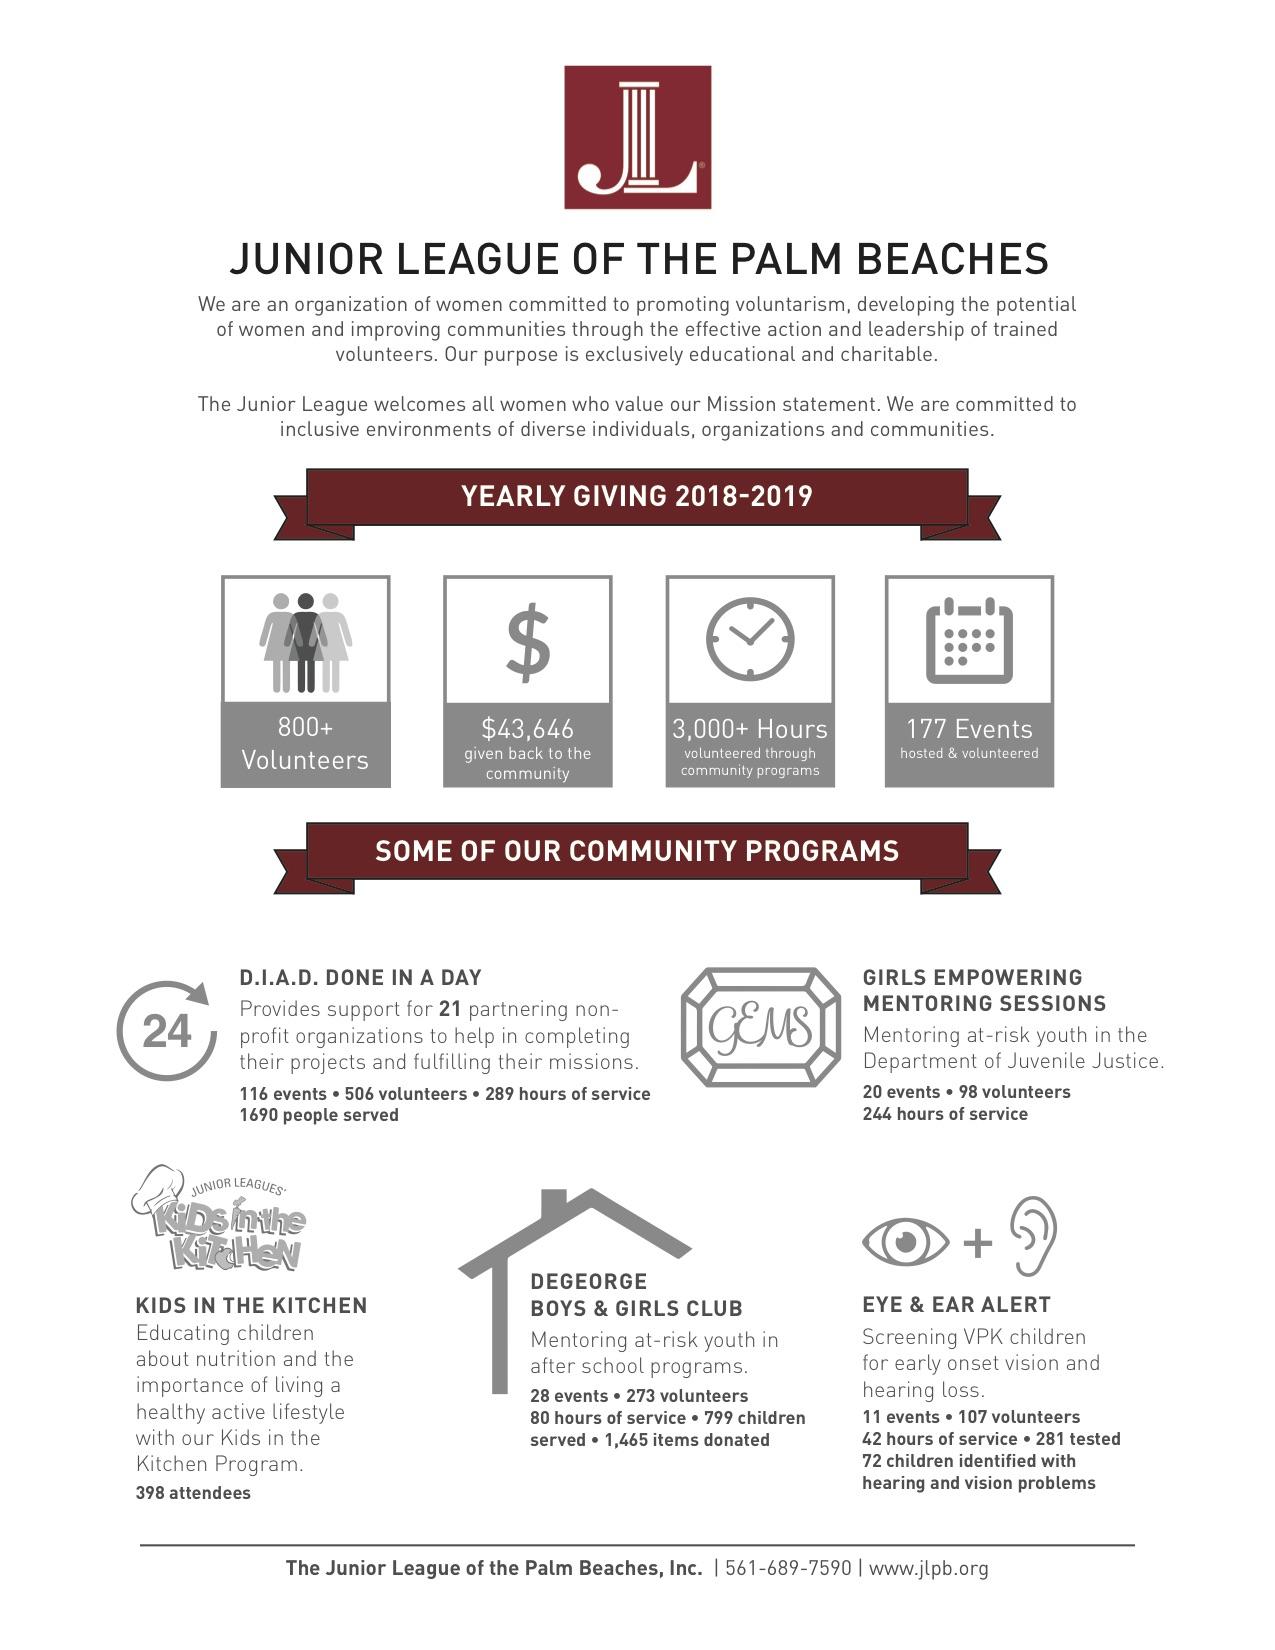 JLPB 2018-2019 community impact